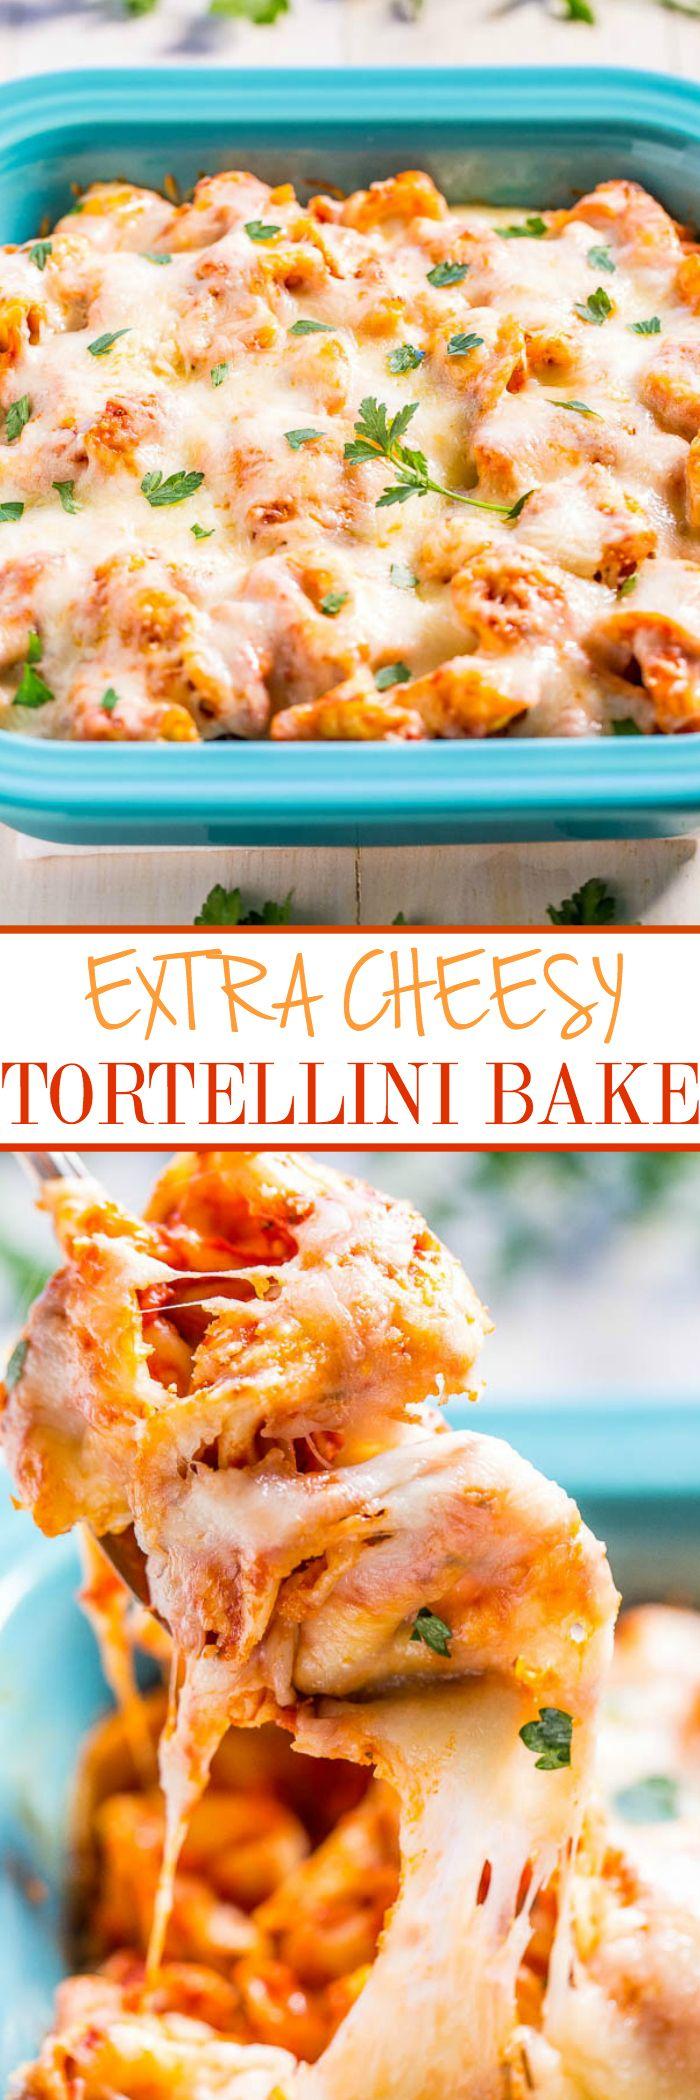 Extra Cheesy Tortellini Bake